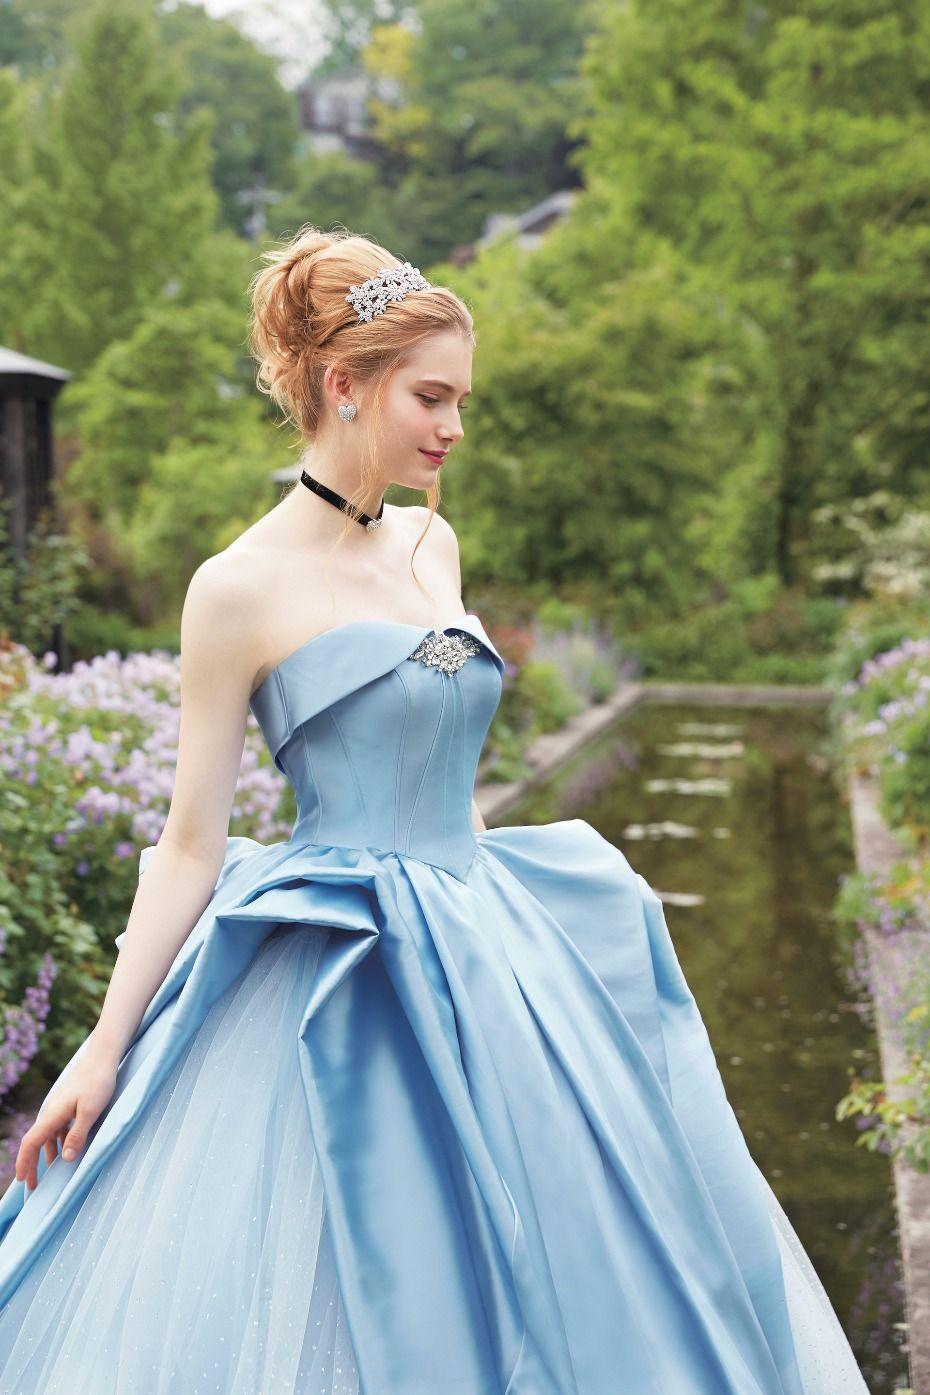 new disney princess wedding gowns reveled clothes pinterest